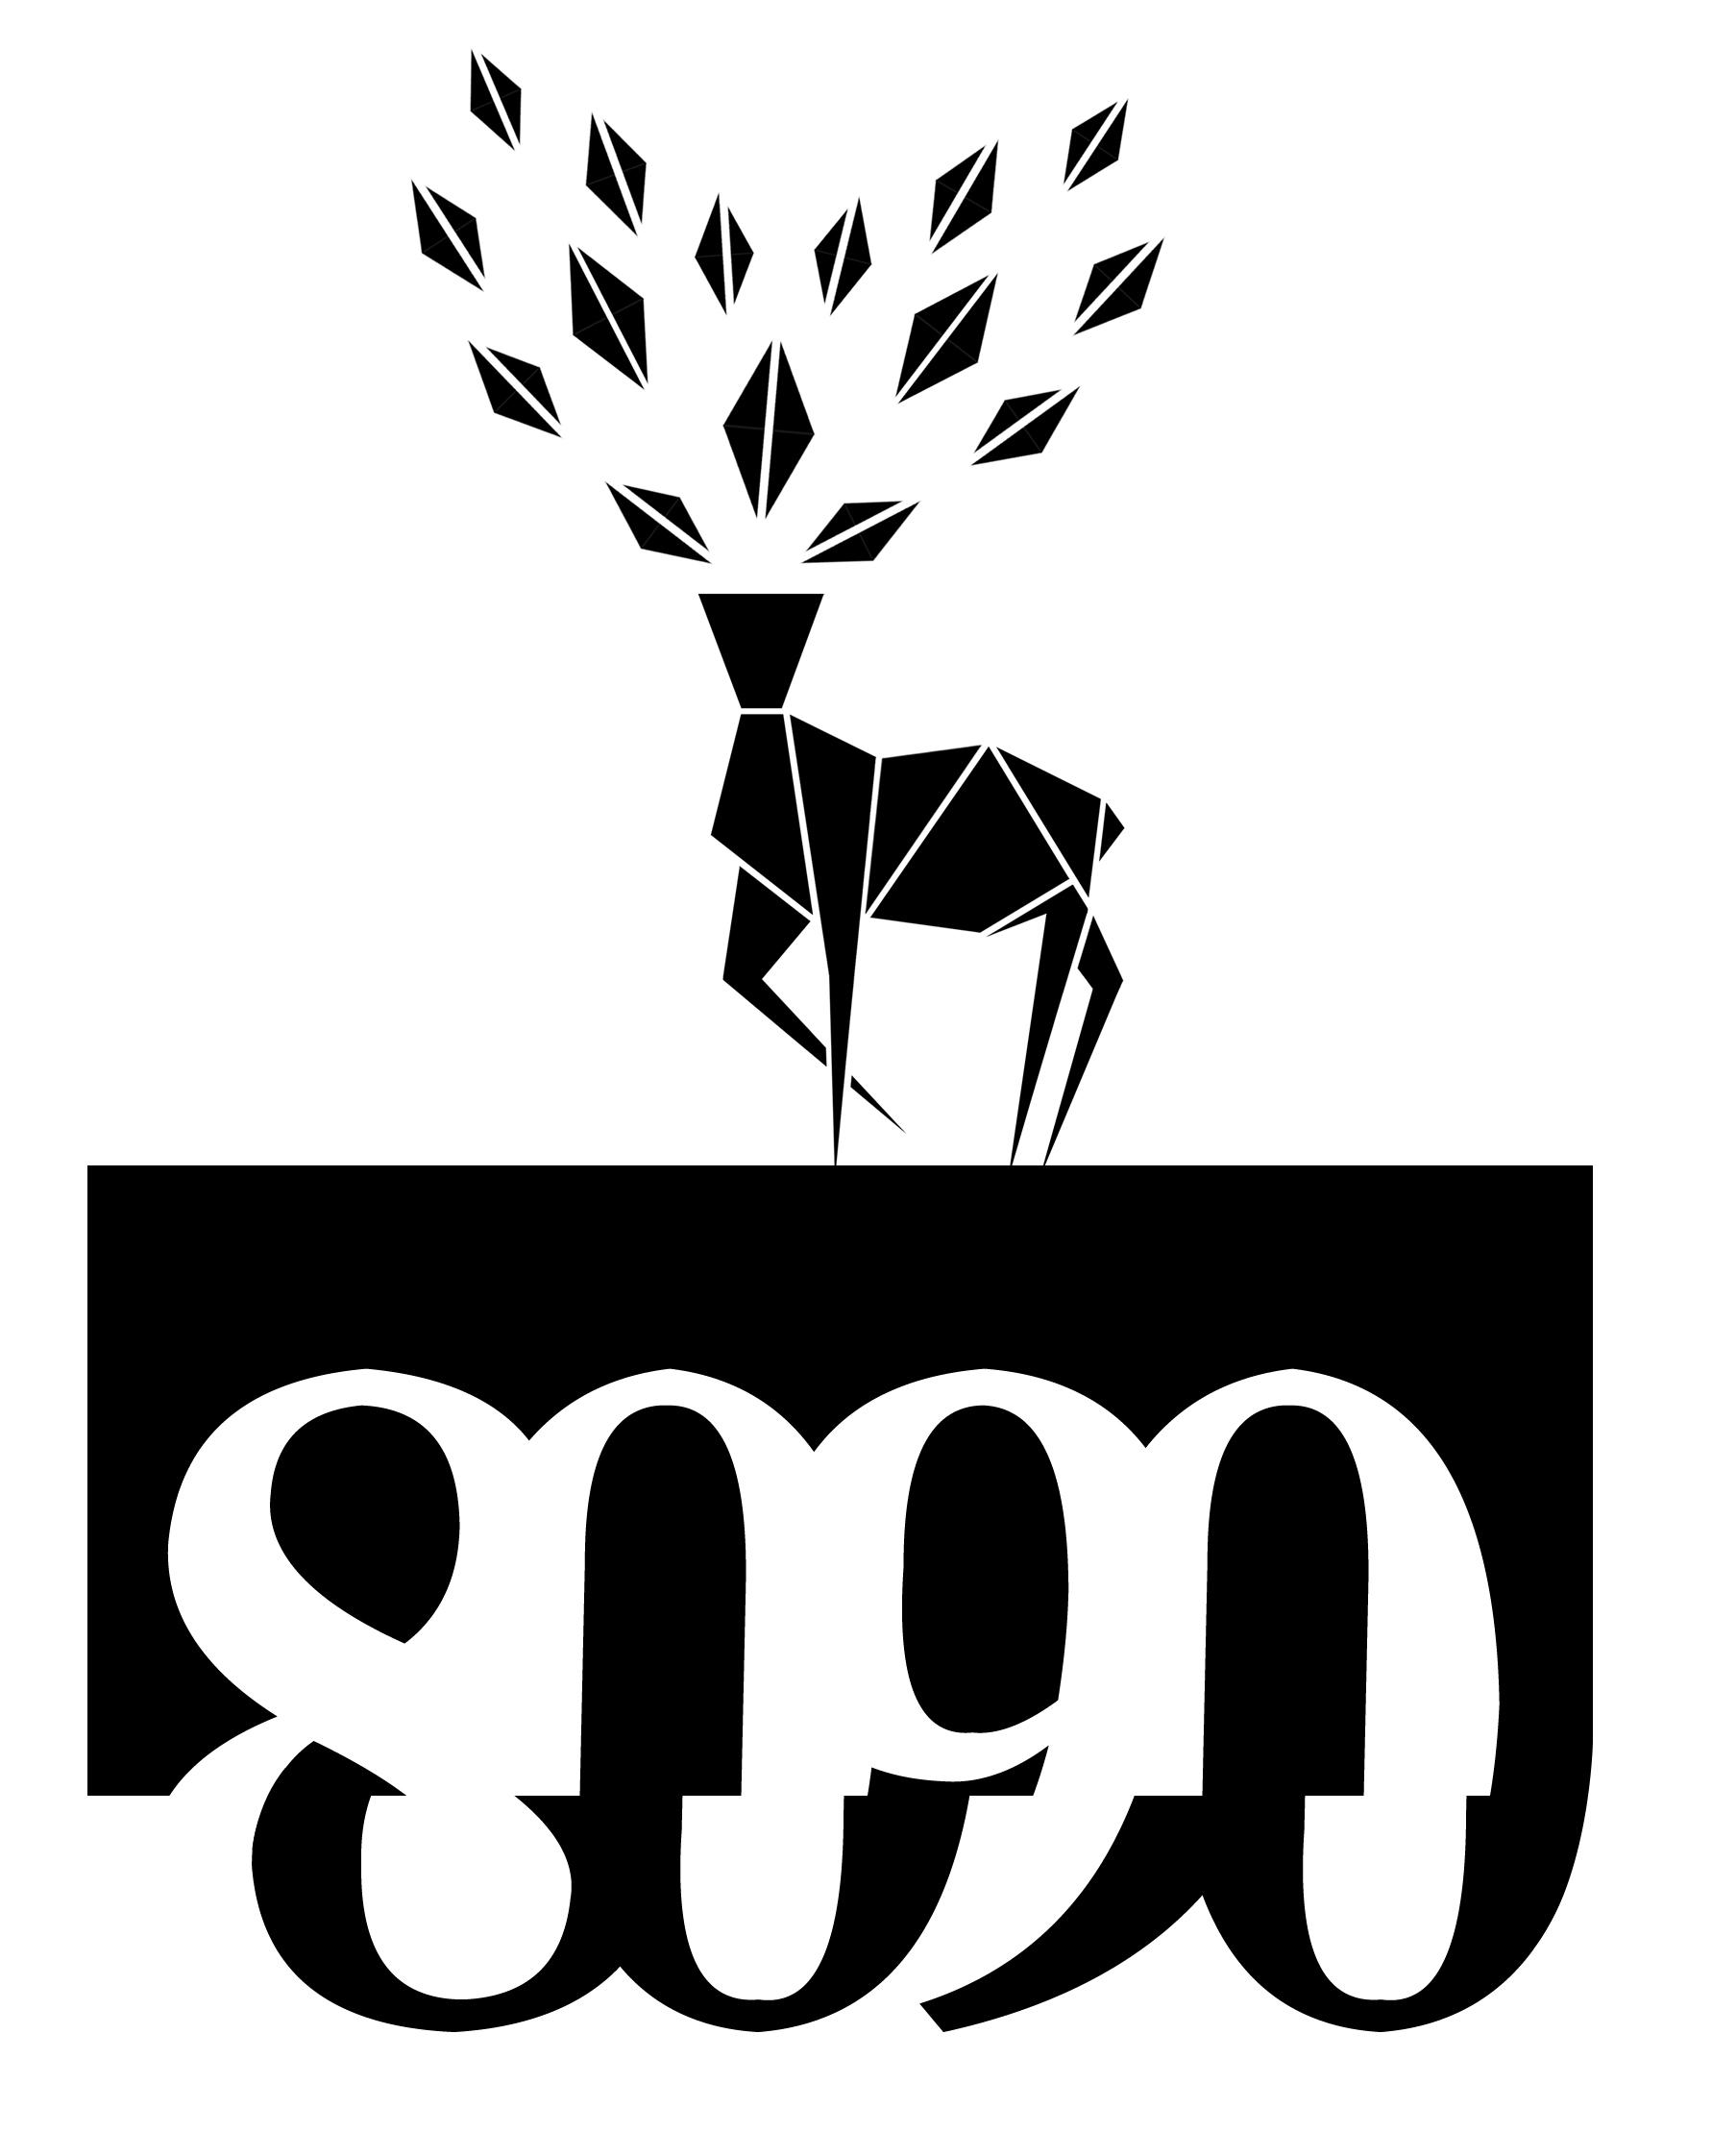 logo logo 标志 设计 矢量 矢量图 素材 图标 1782_2244 竖版 竖屏